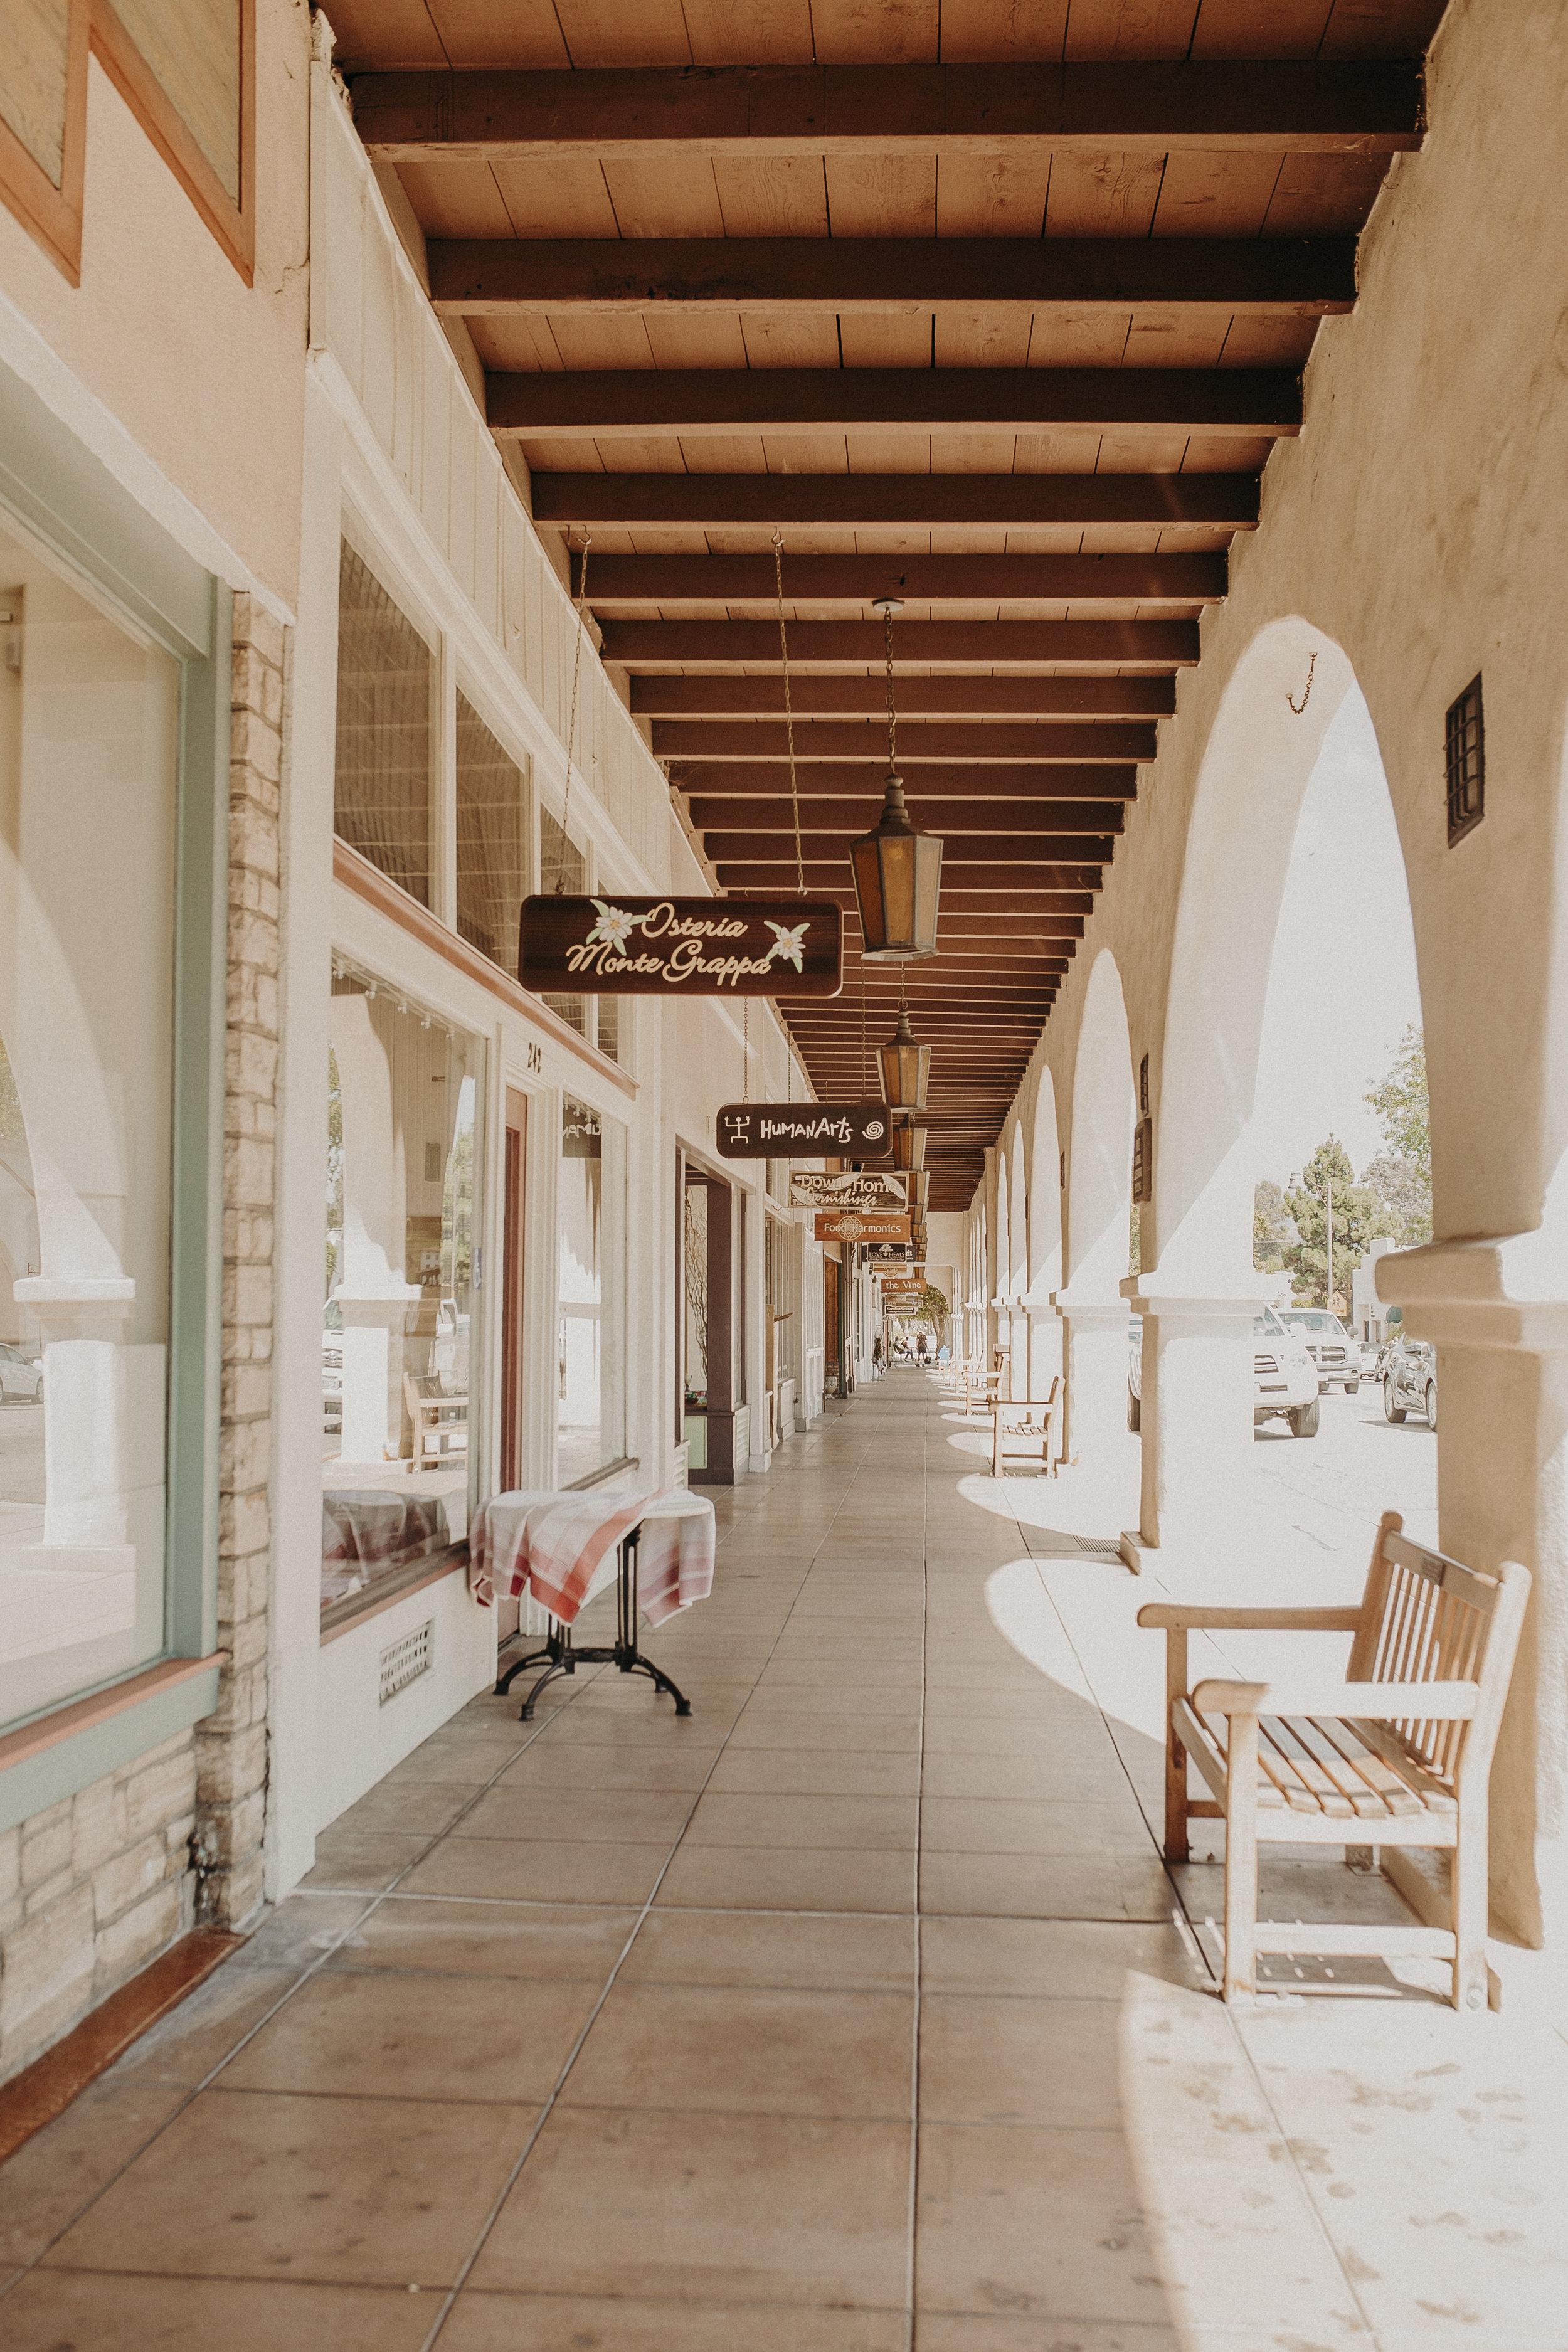 ojai-california-travel-guide-what-to-see-do-eat-7.jpg